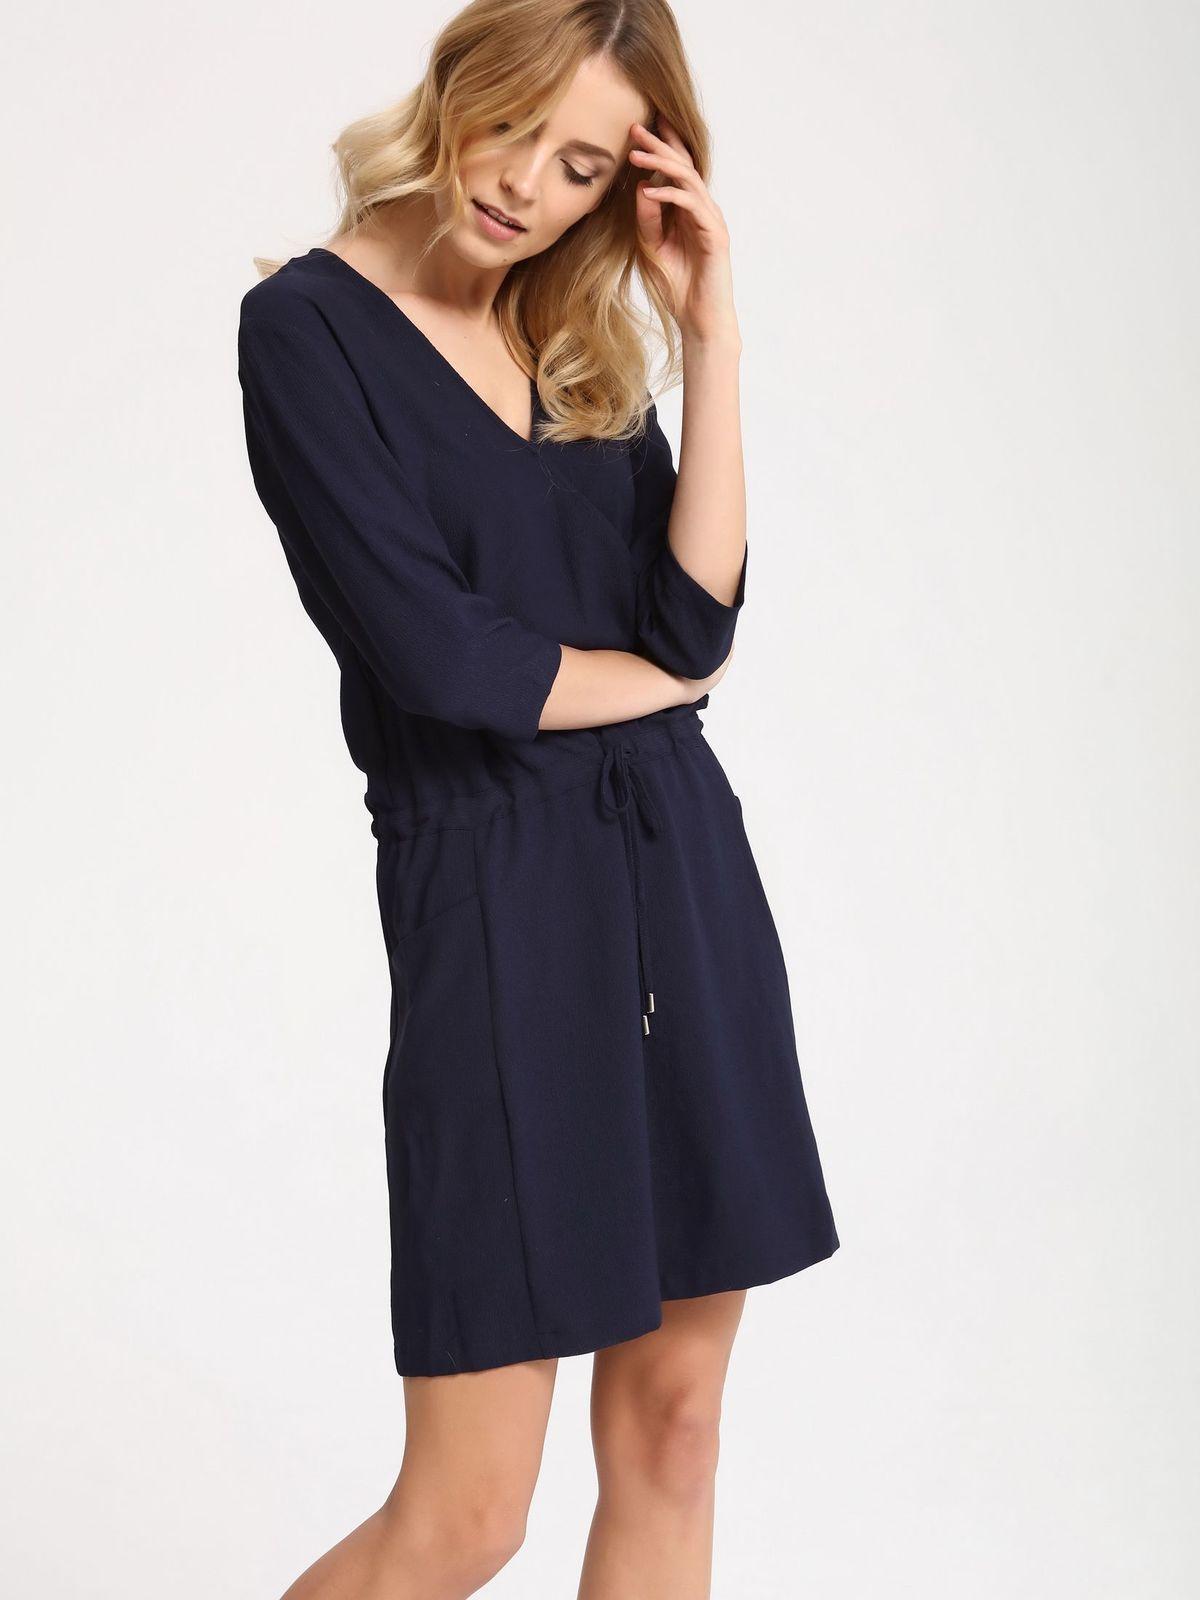 top secret φορεμα - 145430